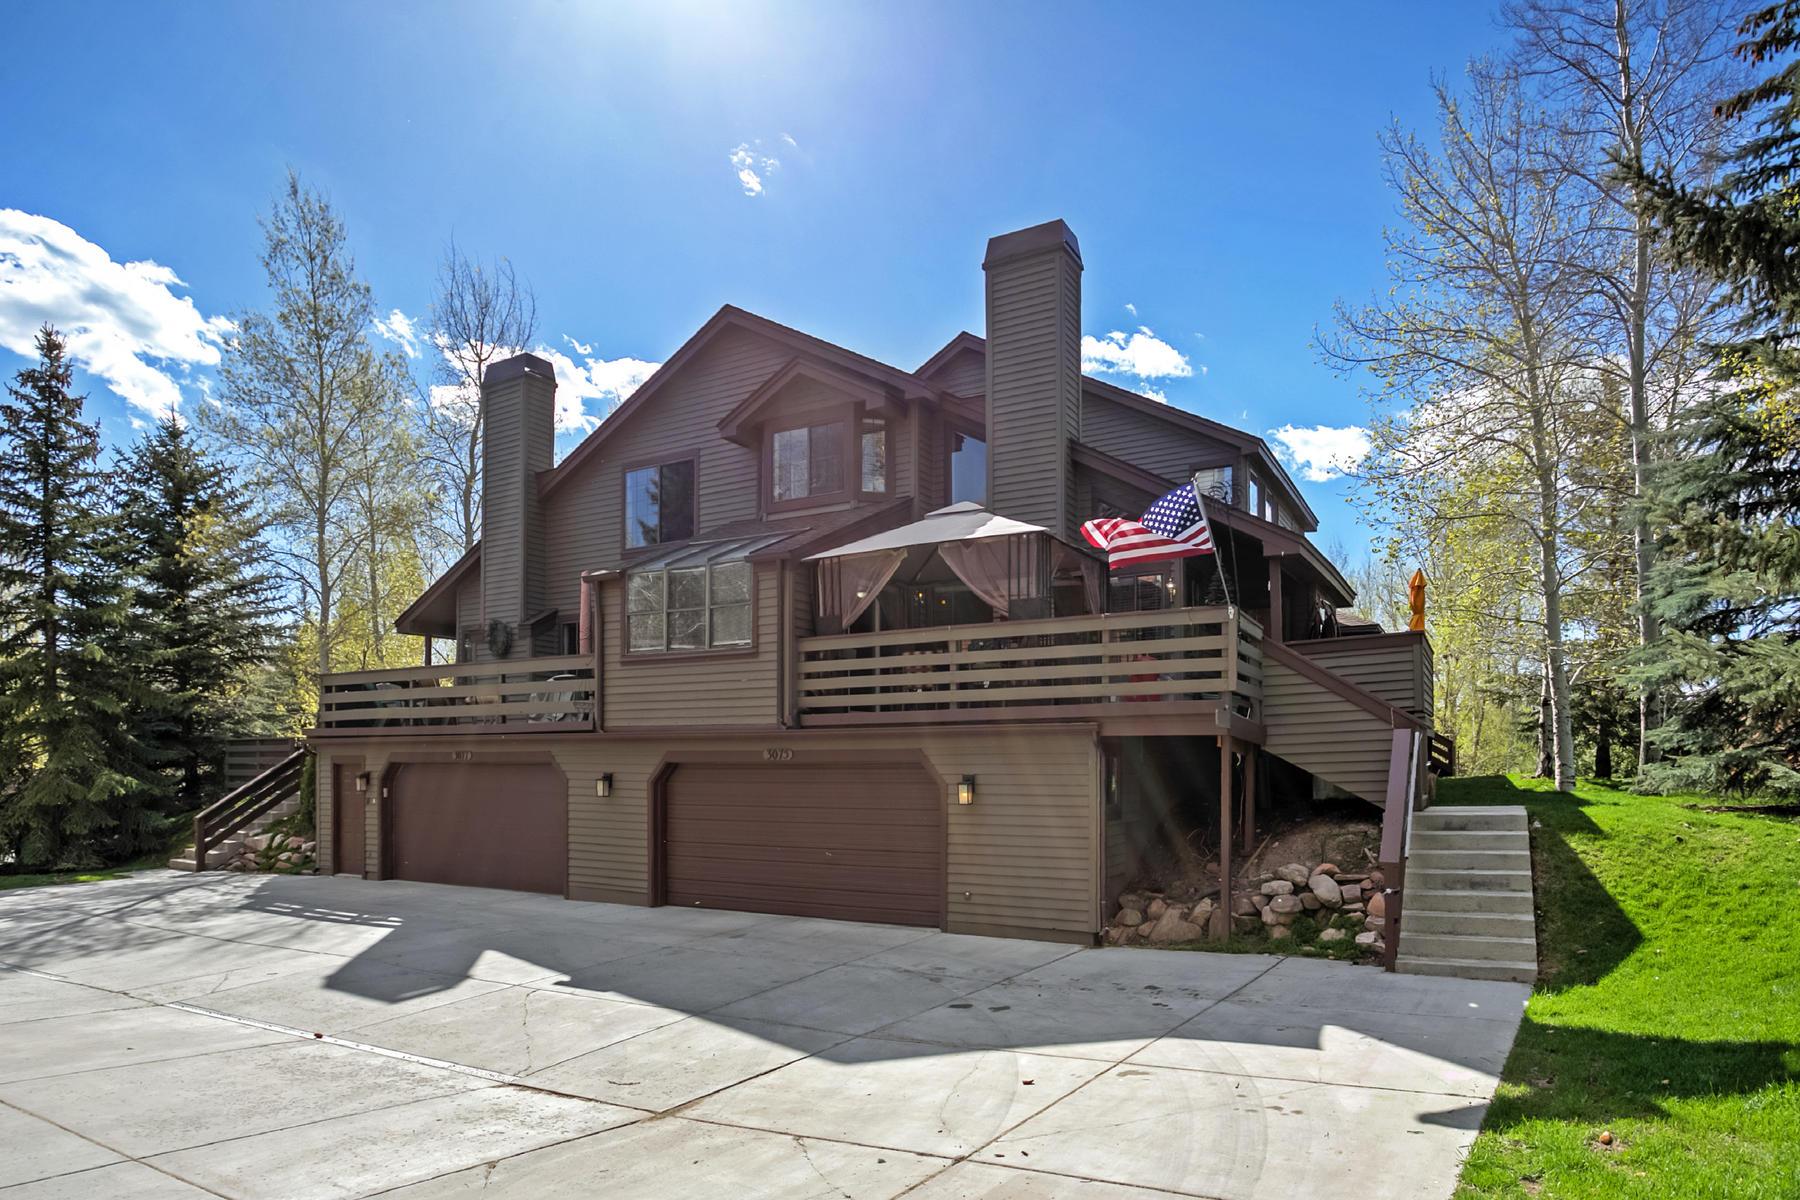 Condominium for Sale at Great Location In Elk Run 3075 Elk Run Drive Unit# 2002 Park City, Utah, 84098 United States